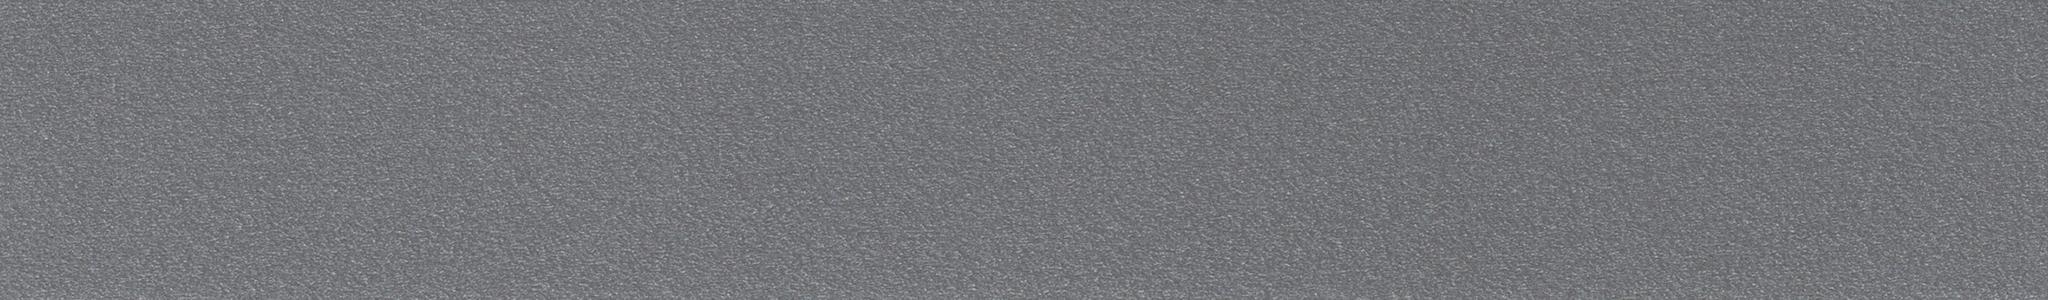 HD 297014 ABS Edge Anthracite Metallic Pearl Softmatt